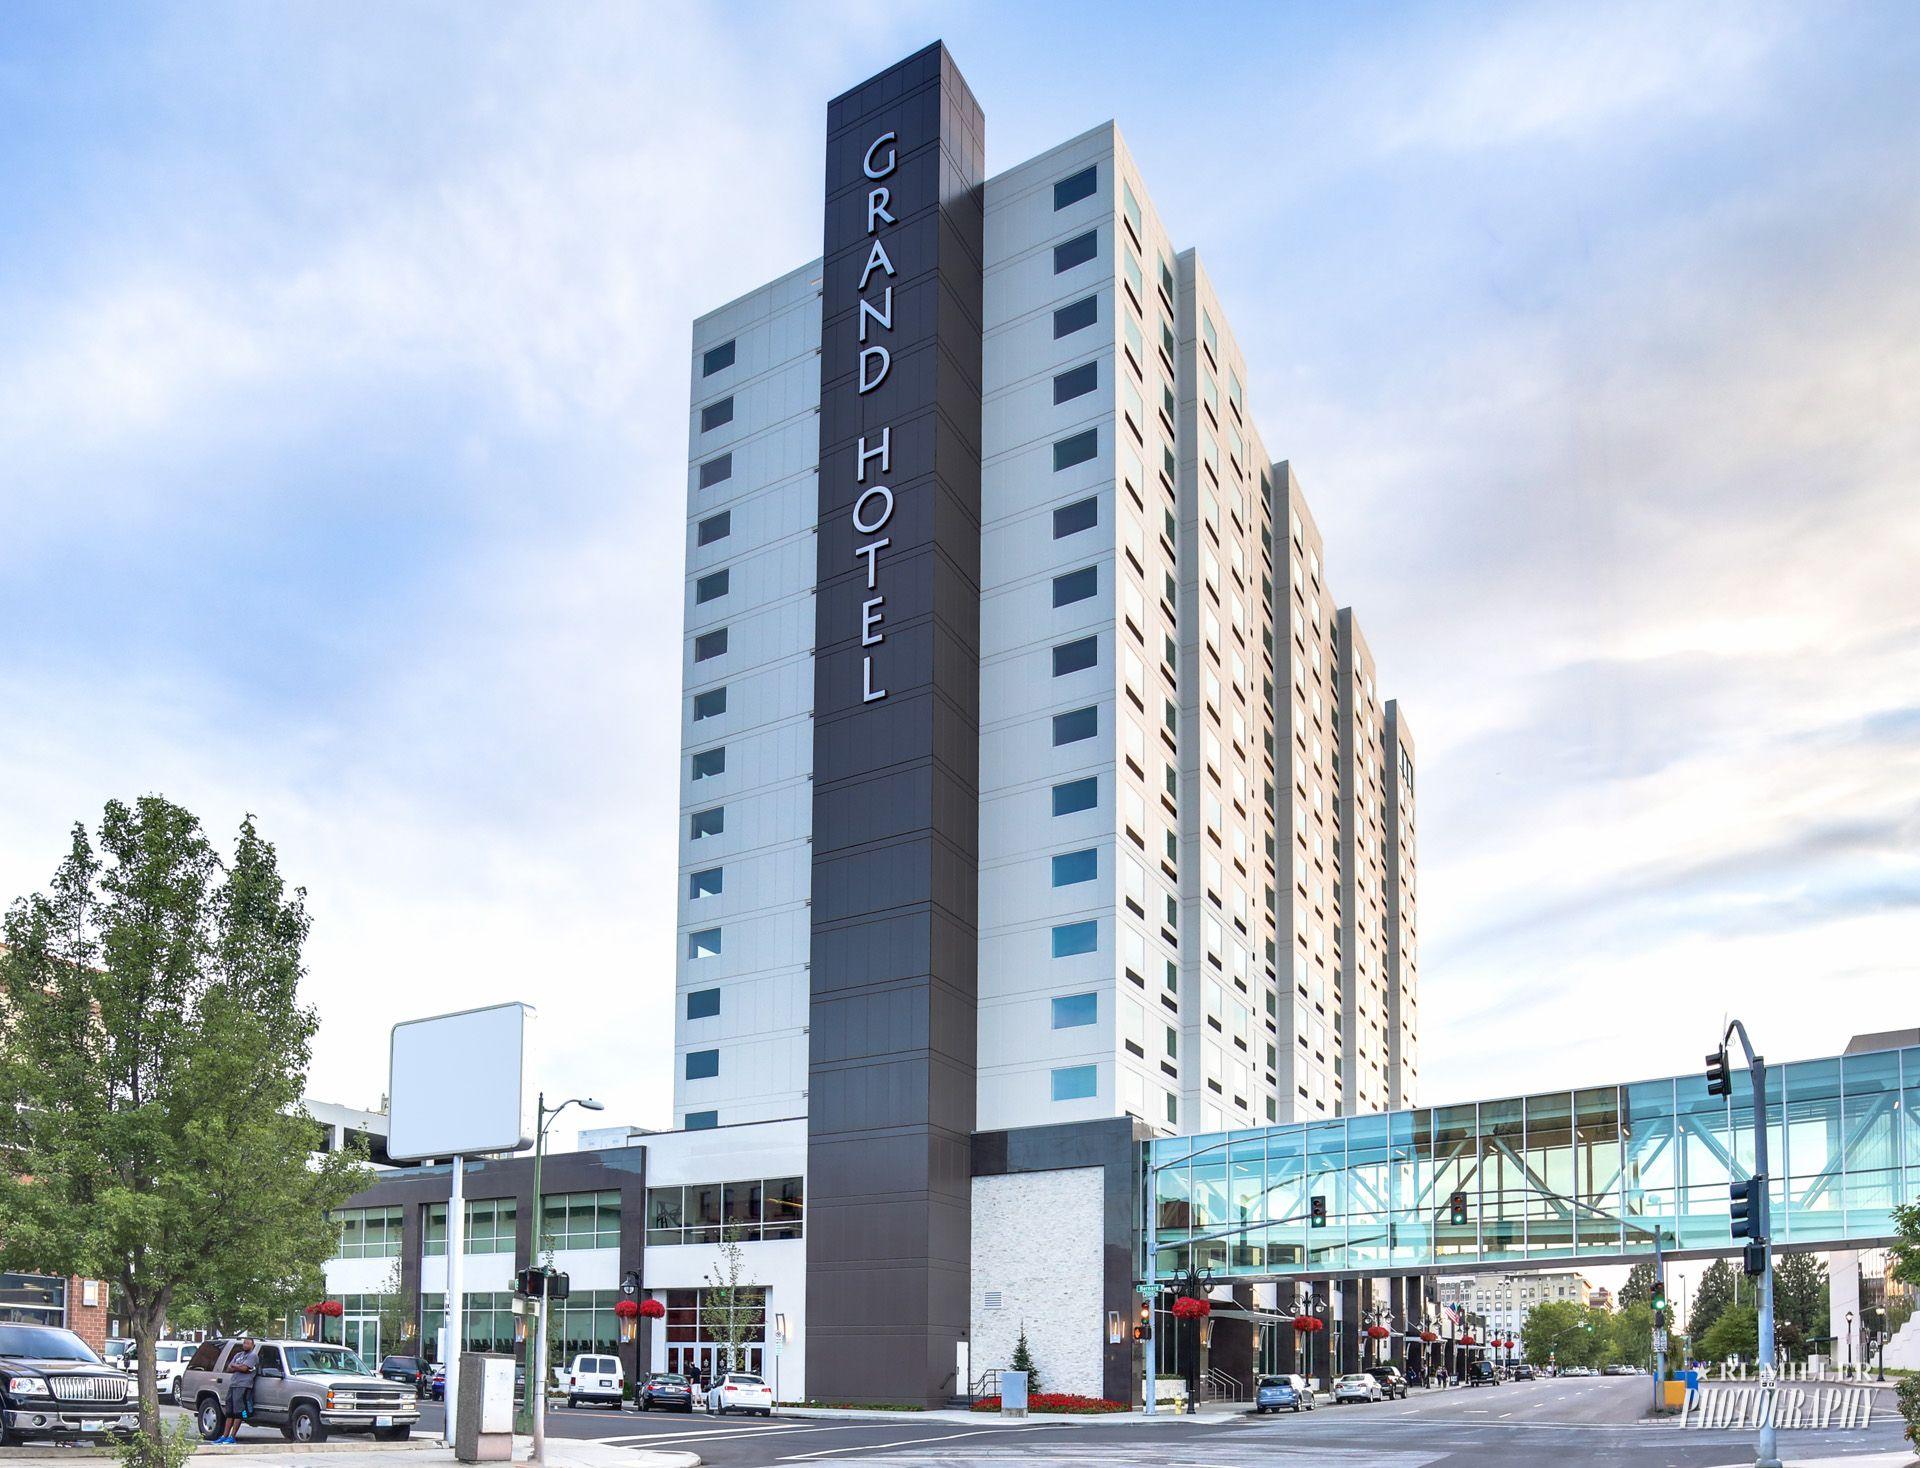 Davenport Grand Hotel Spokane Wa Architectural Photography